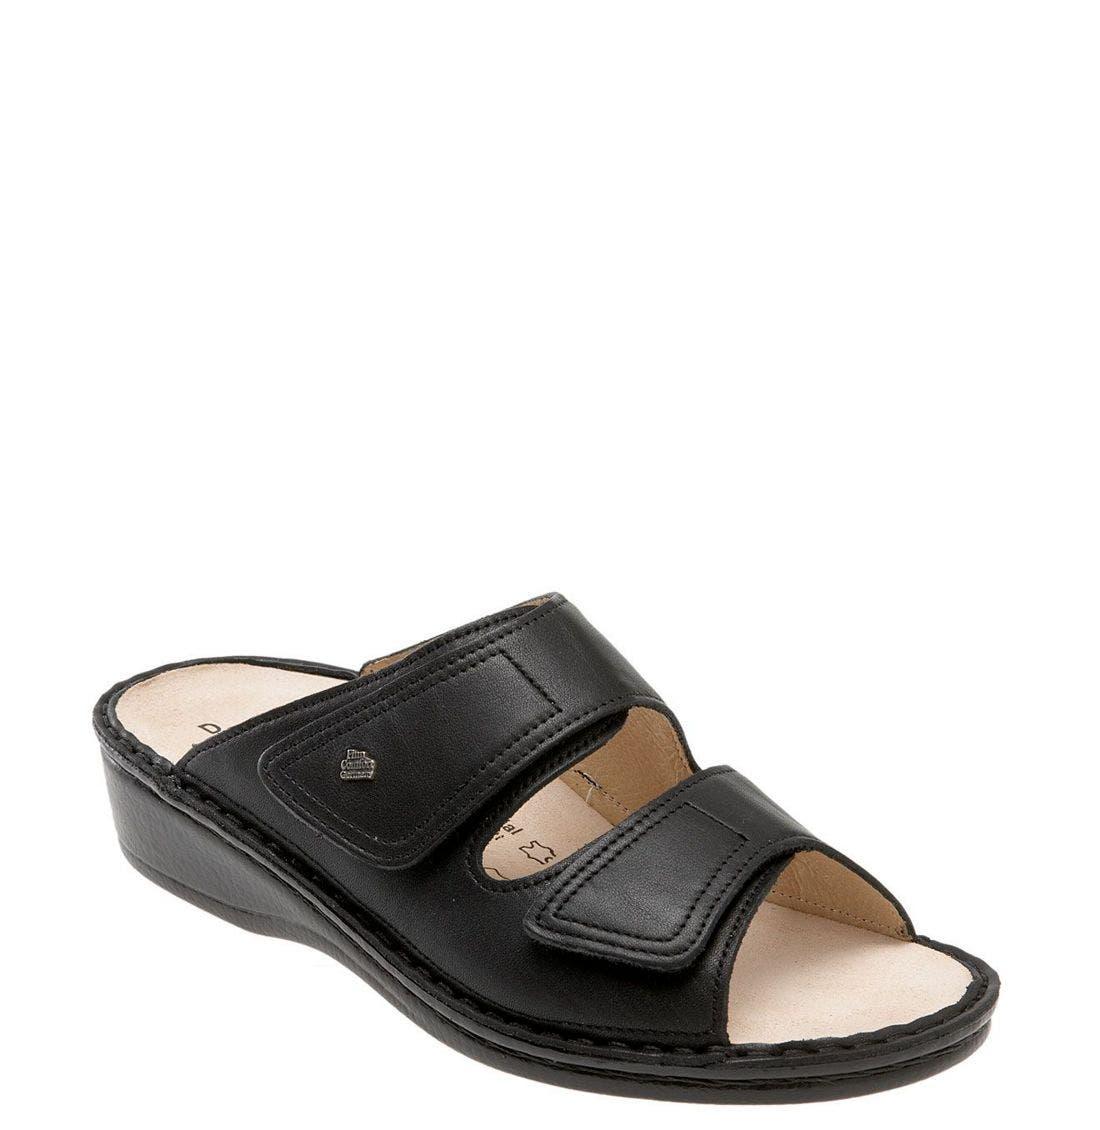 'Jamaica' Sandal,                         Main,                         color, BLACK NAPPA